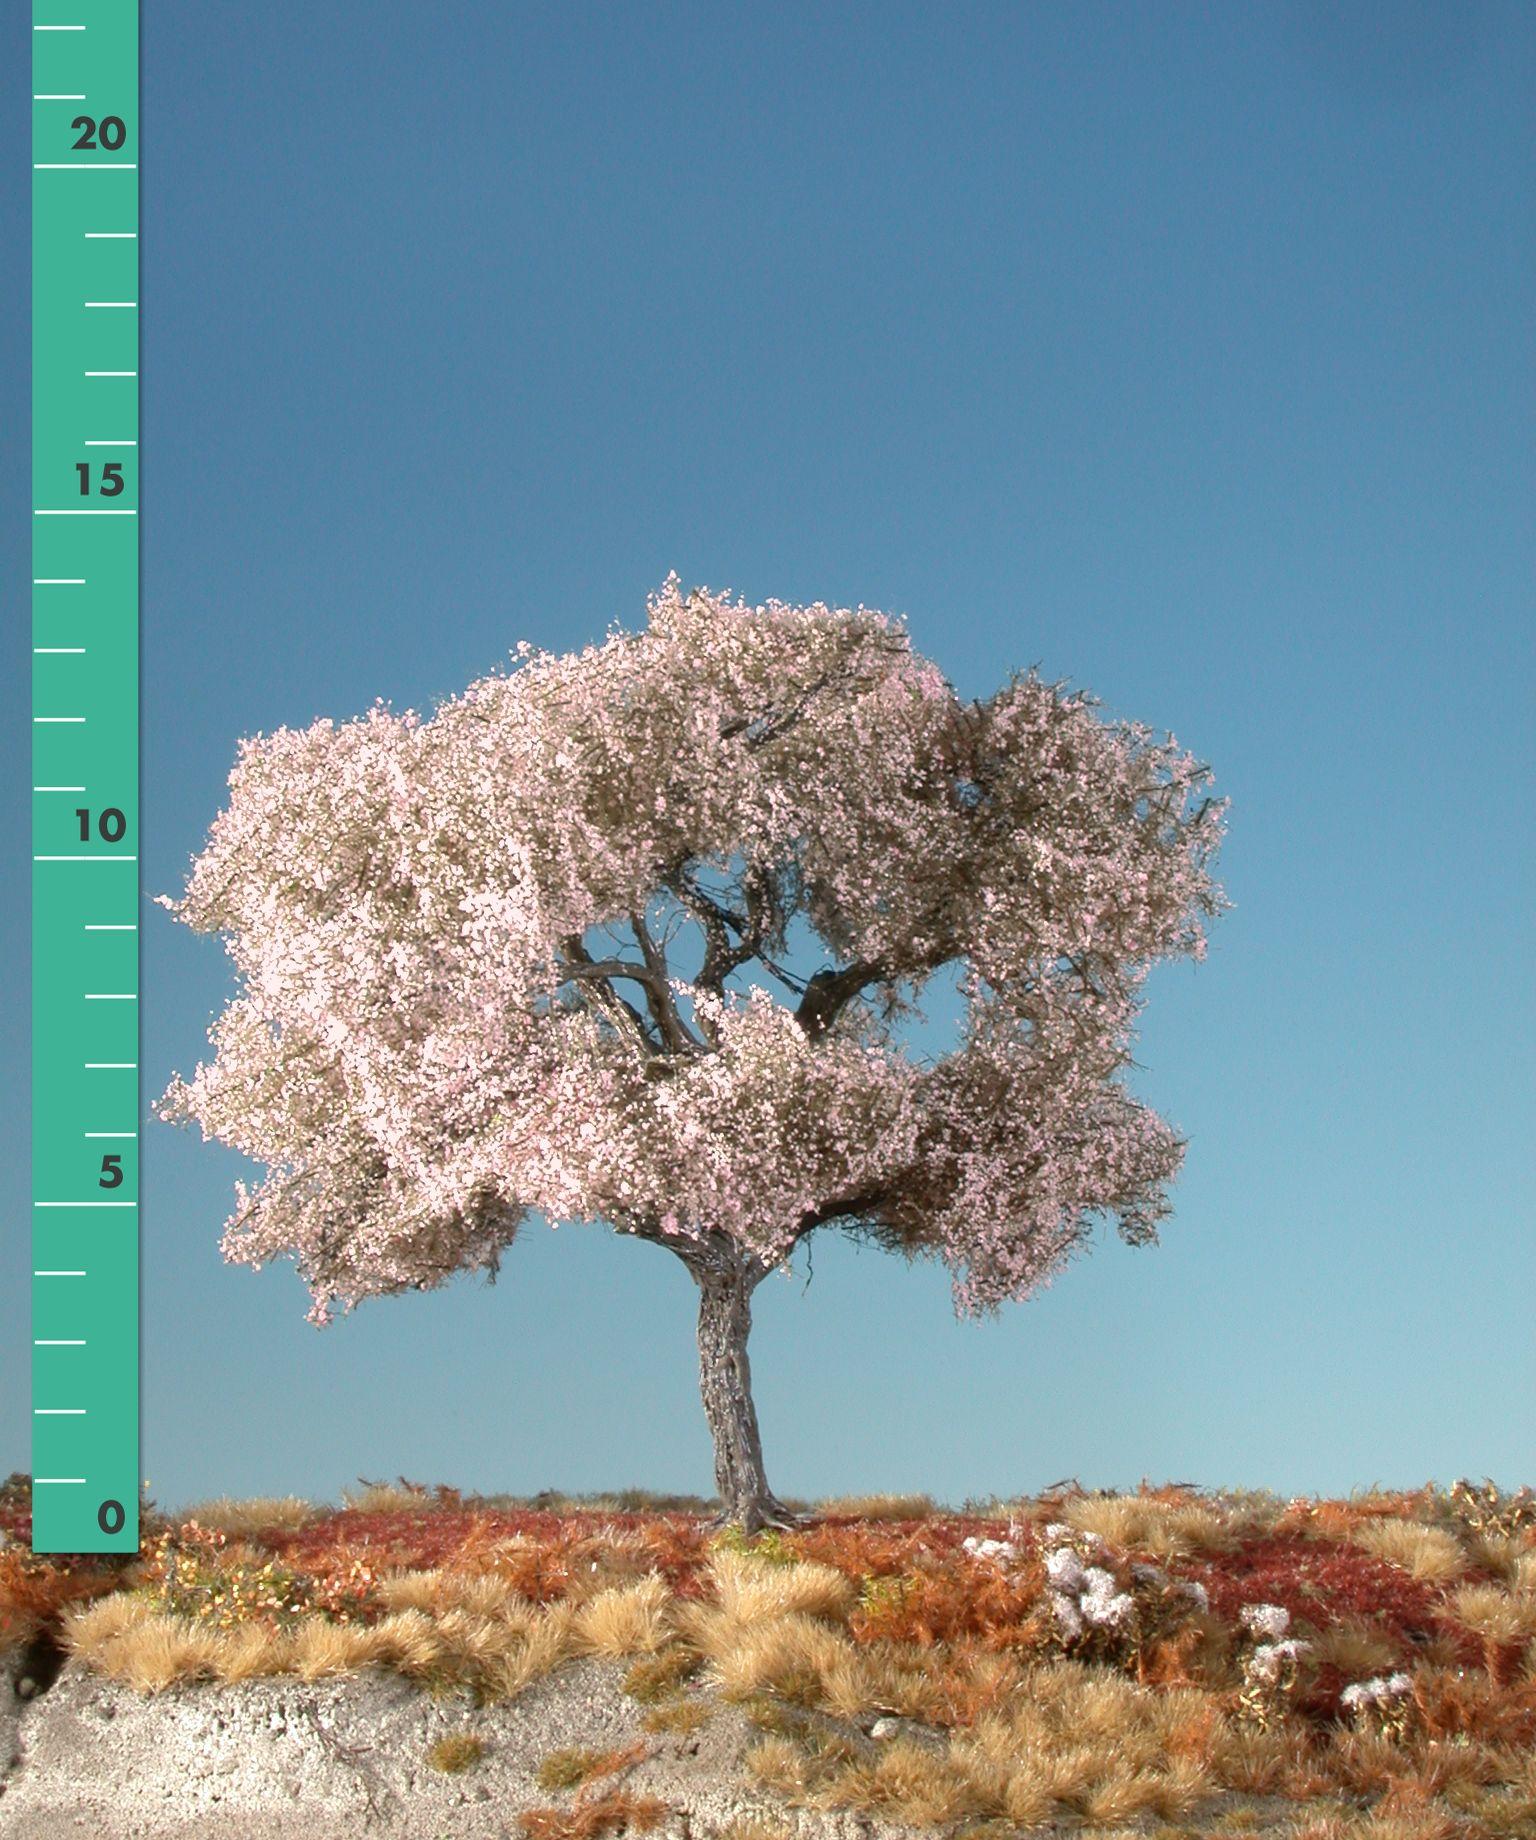 kirschbaum 1 87 rosa modellbaum miniaturmodelle b ume pflanzen belaubung filigranb sche. Black Bedroom Furniture Sets. Home Design Ideas